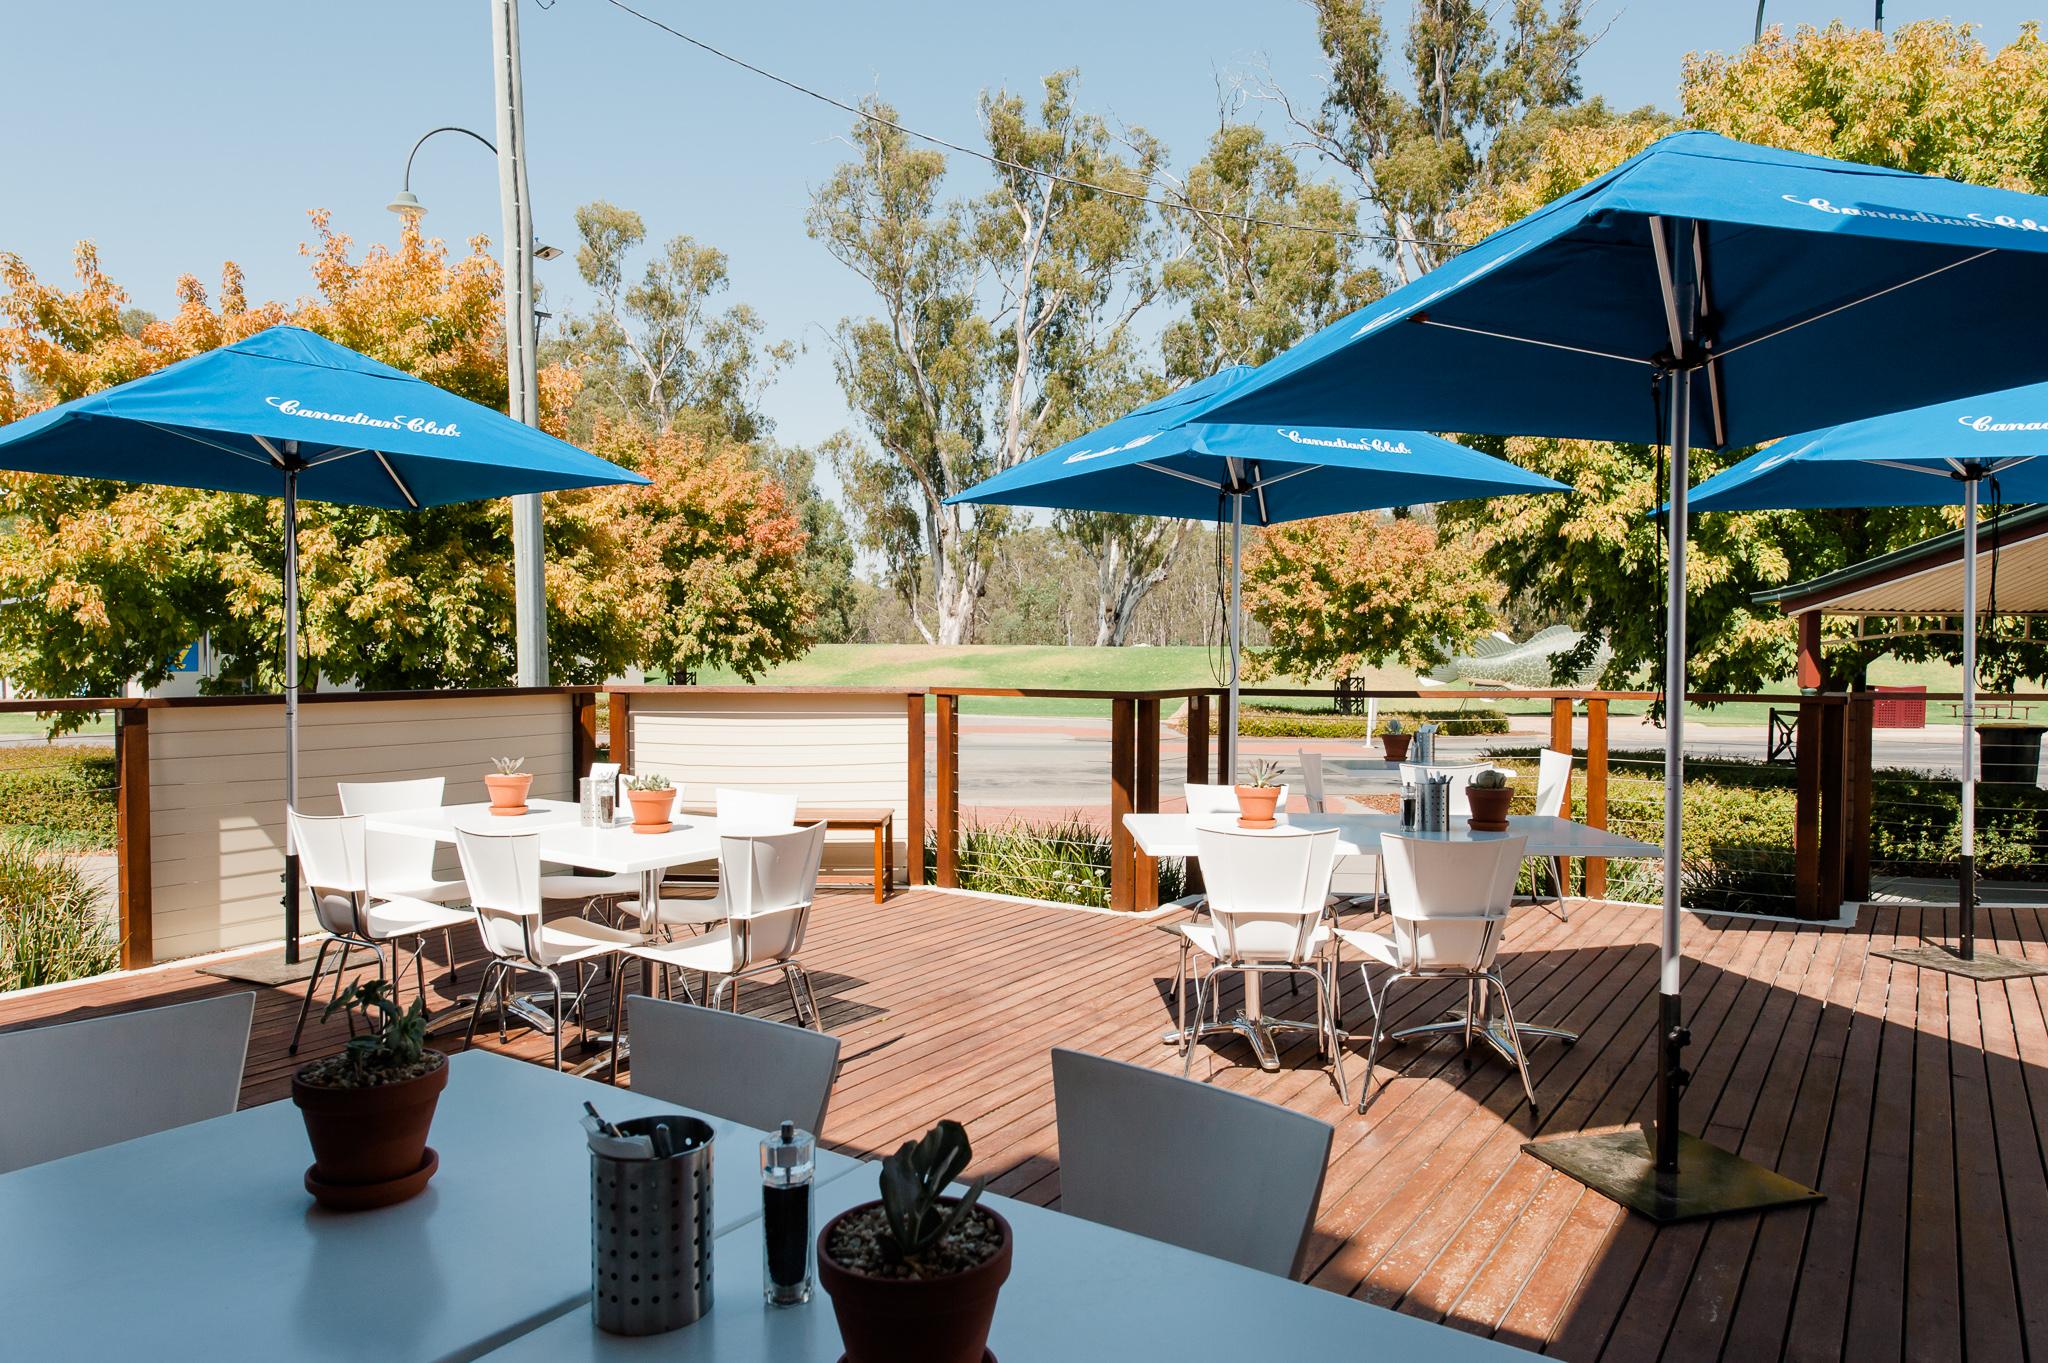 2 Outside dining TOB - Georgie James-2.jpg